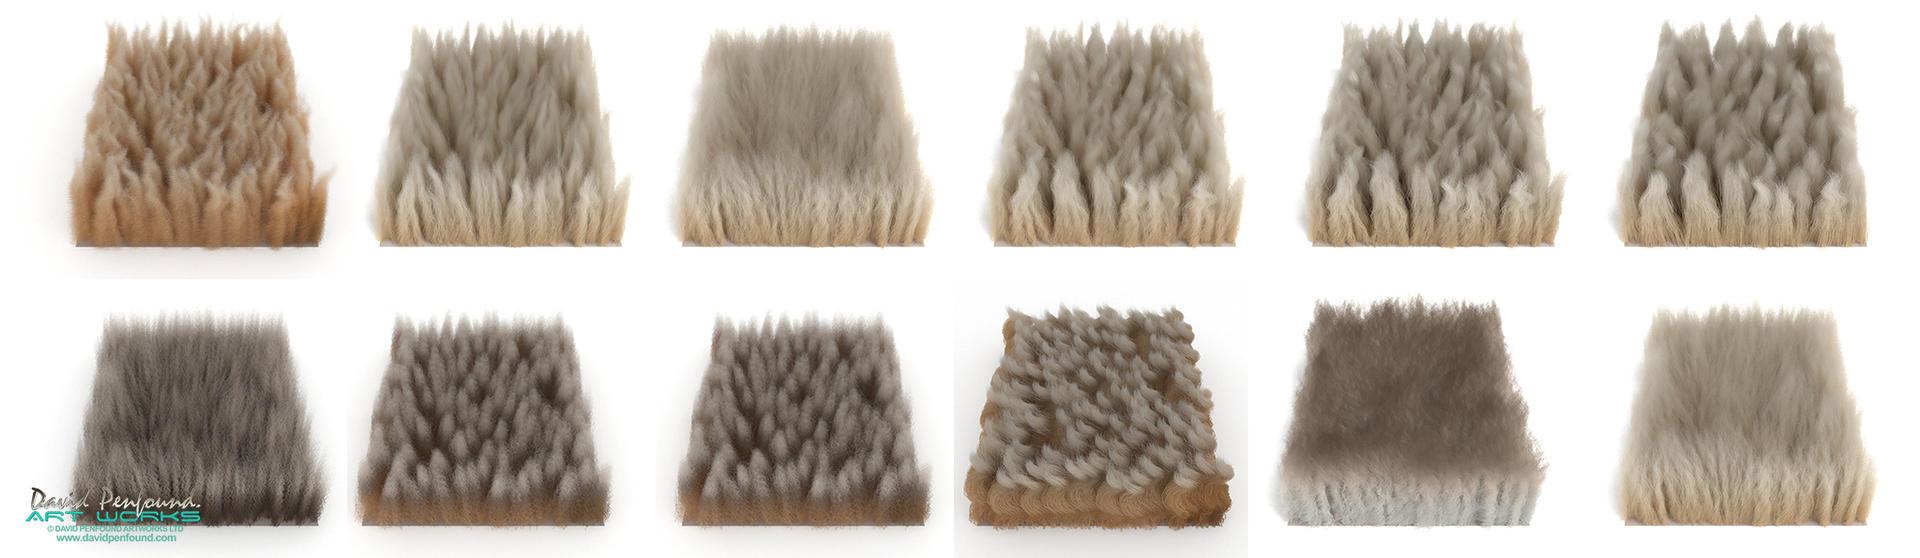 Fur swatch testing